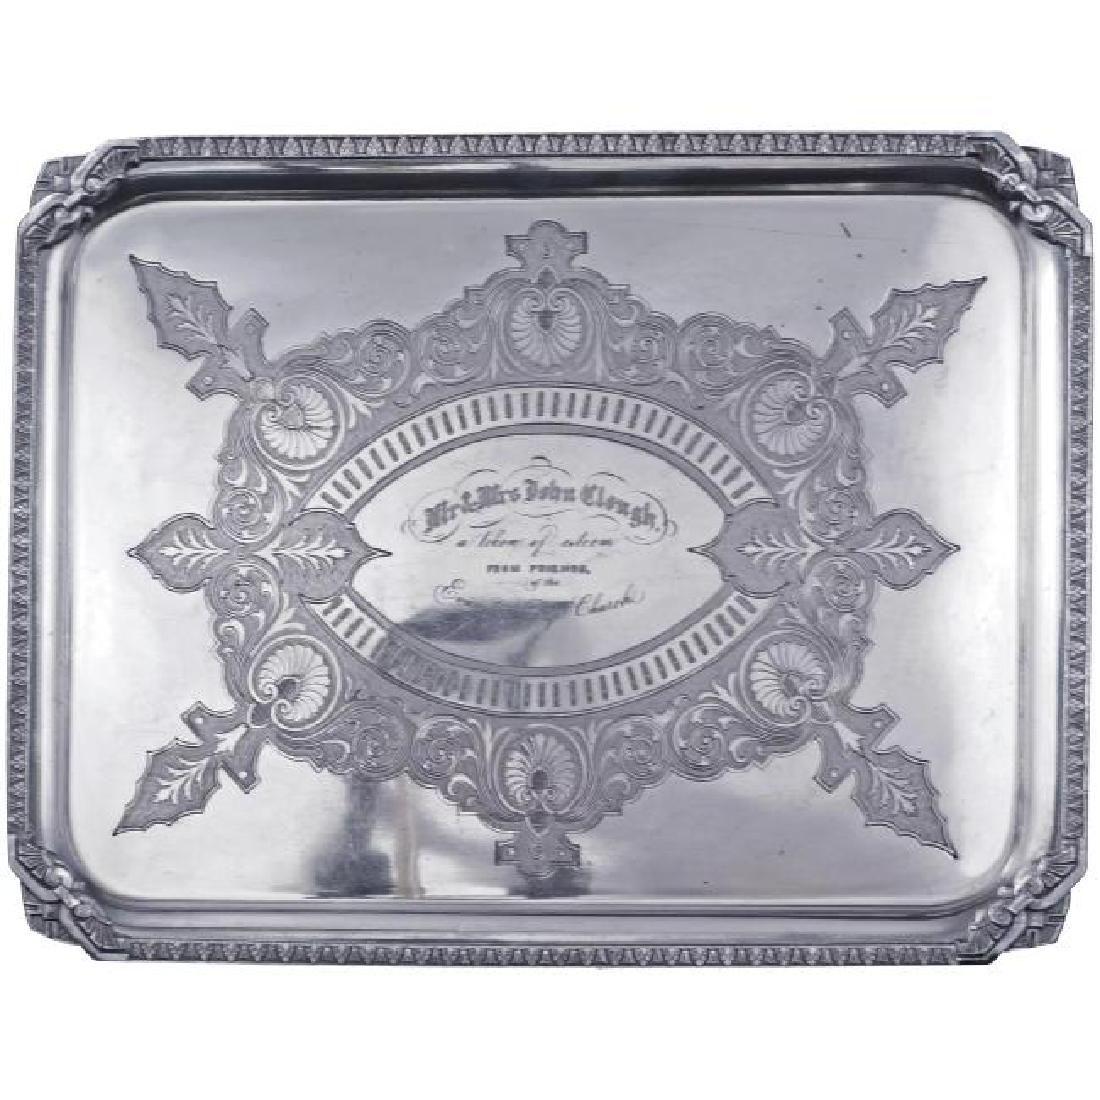 Victorian presentation silver plate tray late 19th